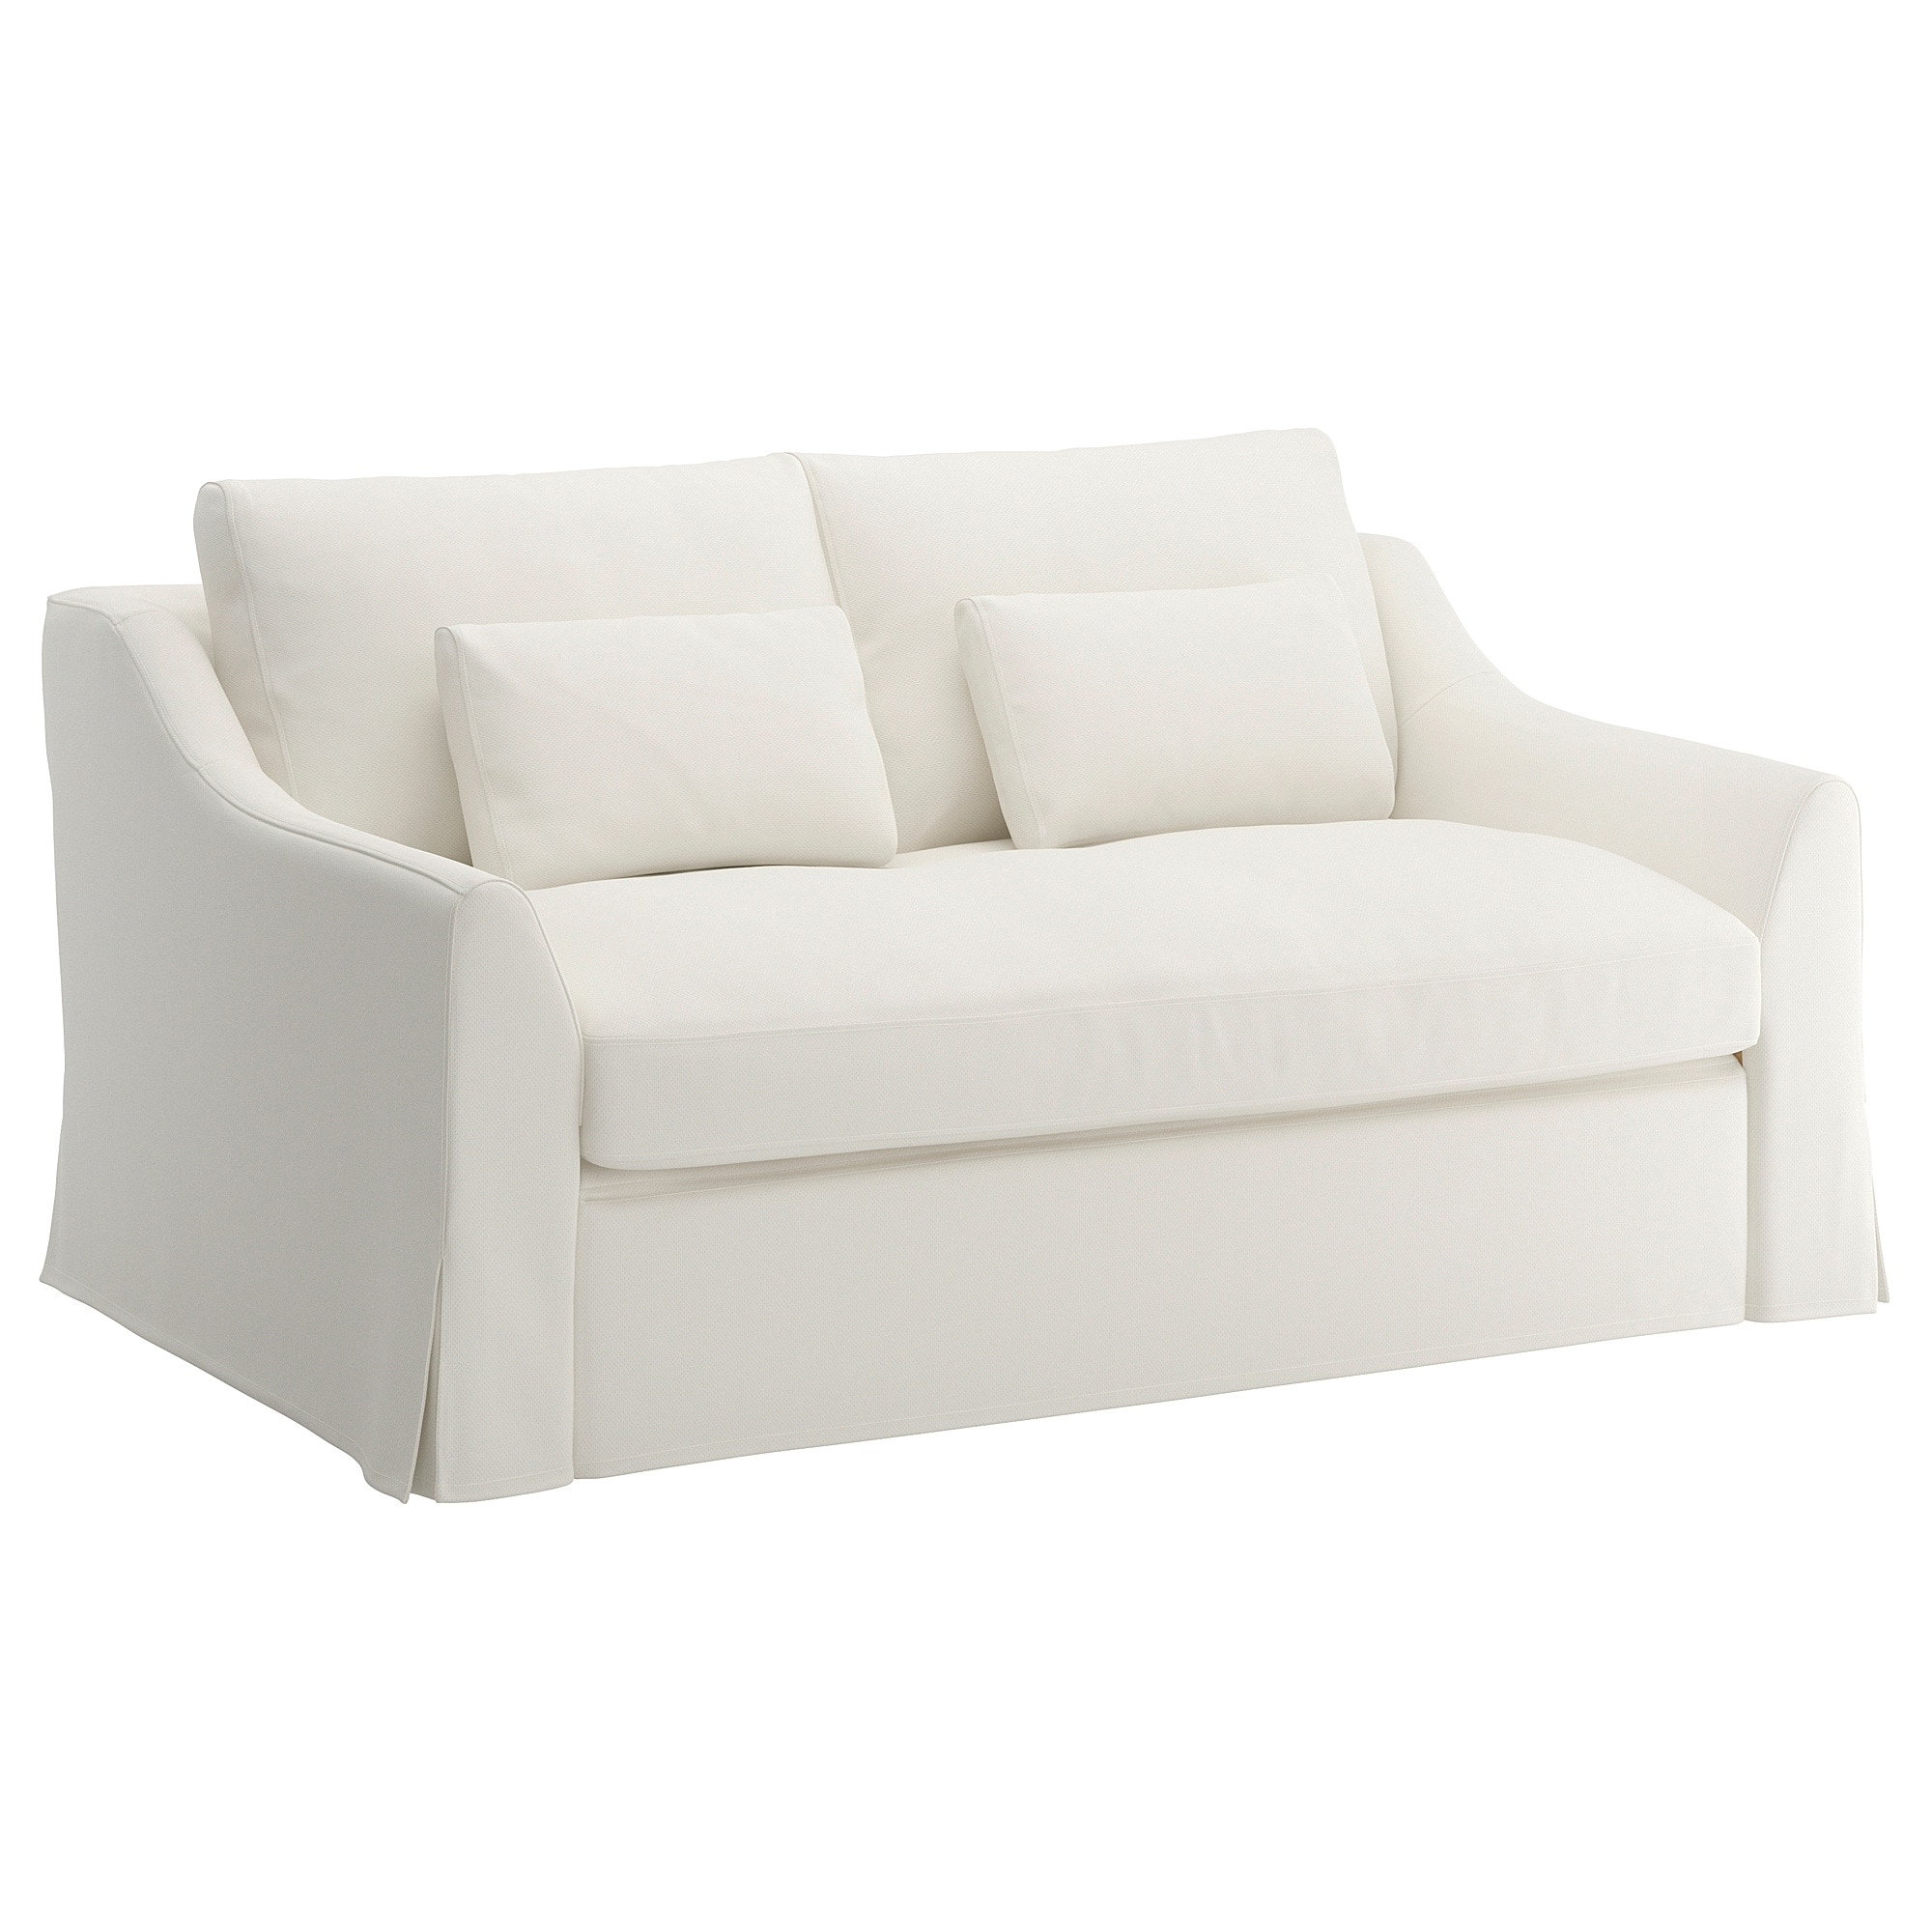 Sofa Cama Italiano Ikea 4pde sofà S Cama De Calidad Pra Online Ikea